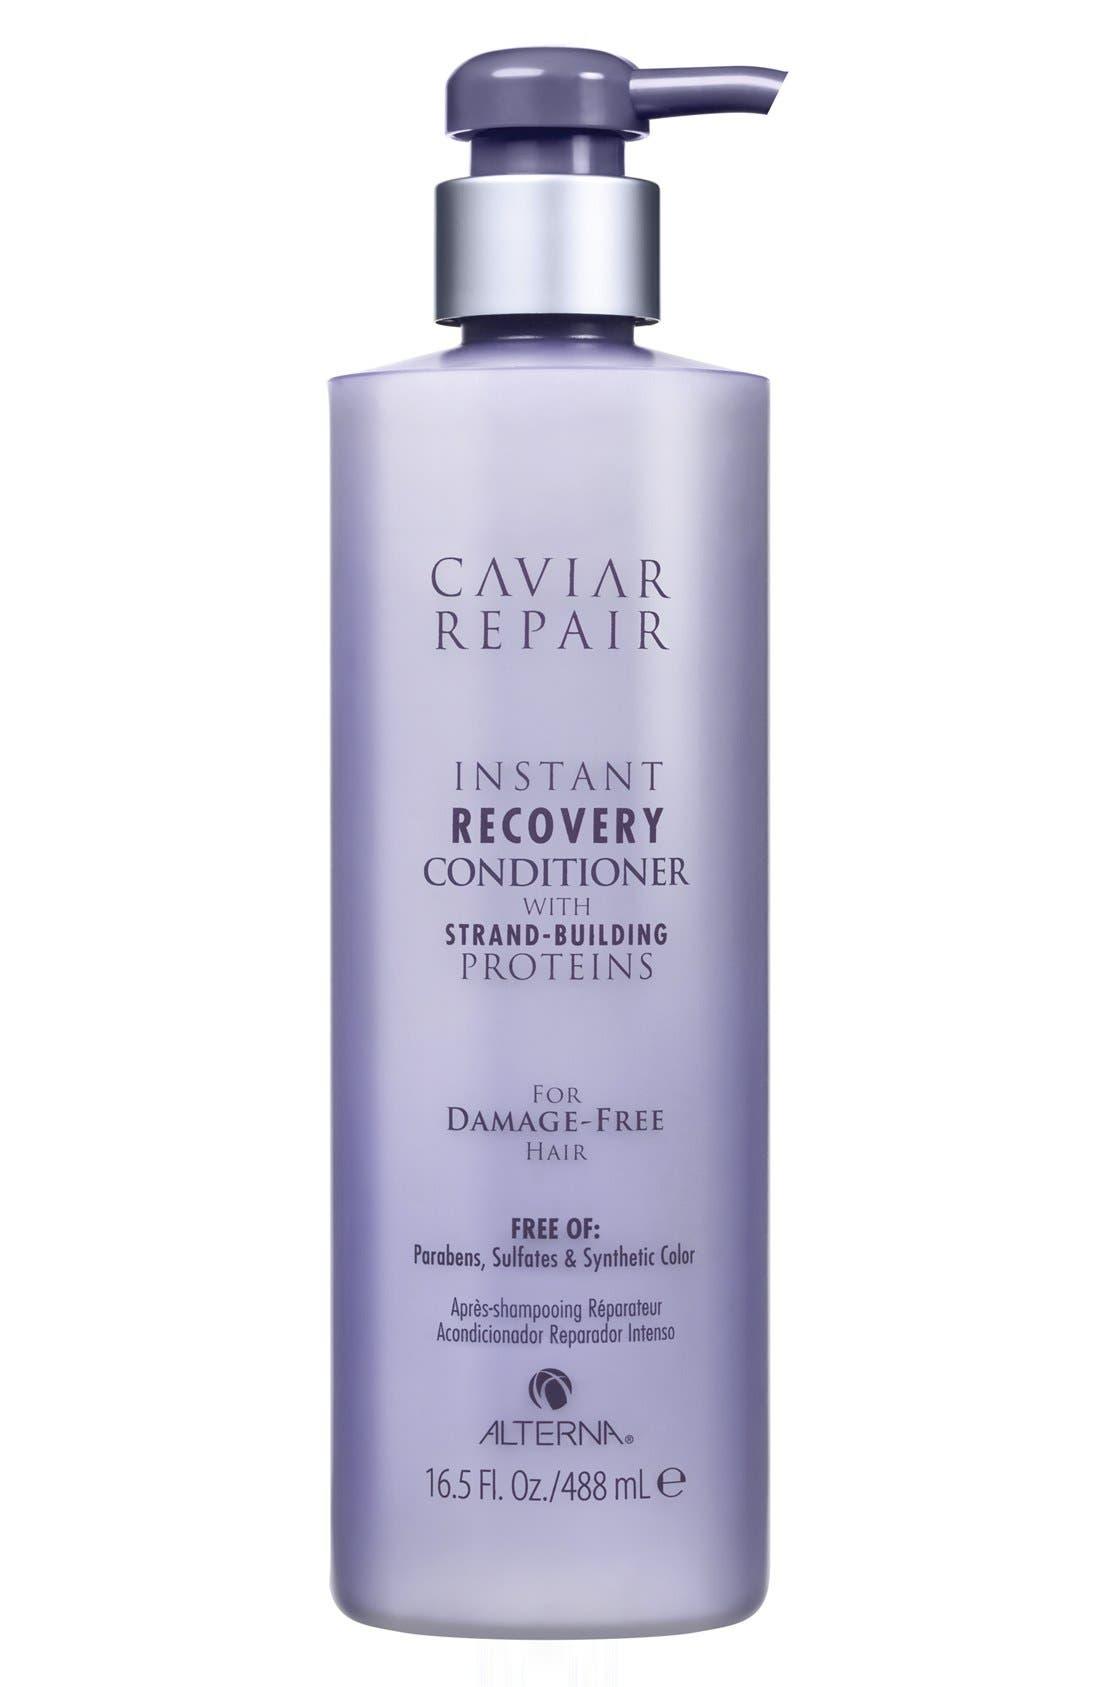 ALTERNA® Caviar Repair Instant Recovery Conditioner